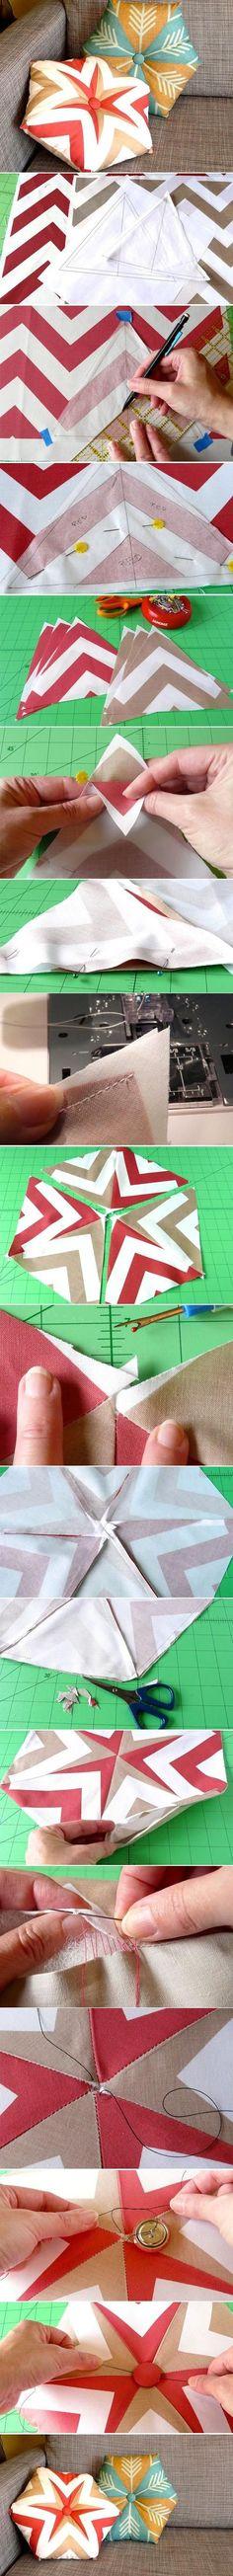 DIY Nice Decorative Pillow DIY Projects / UsefulDIY.com